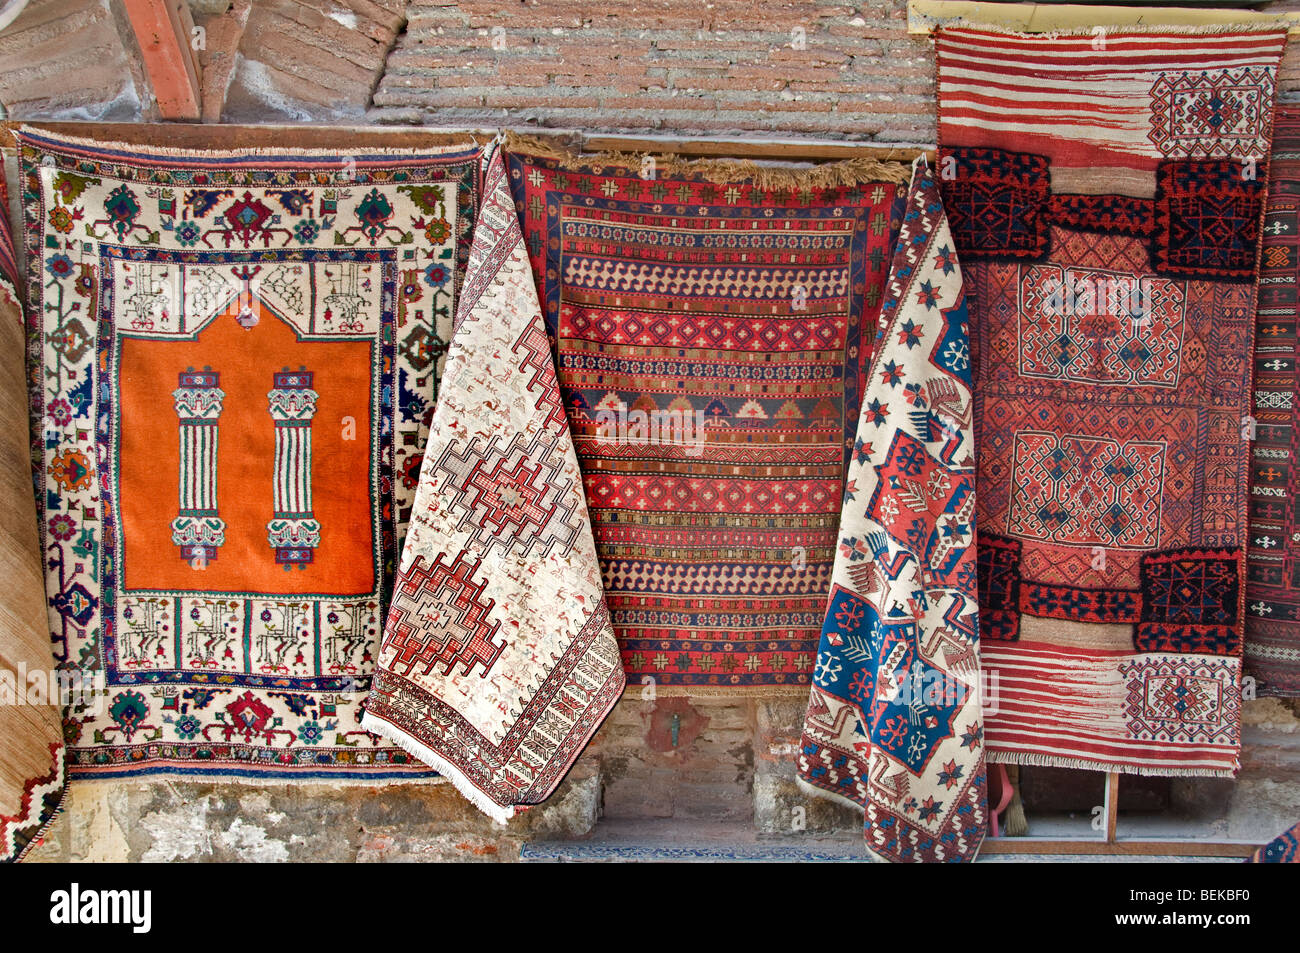 Sultanahmet  Istanbul Turkey carpet carpets shop - Stock Image